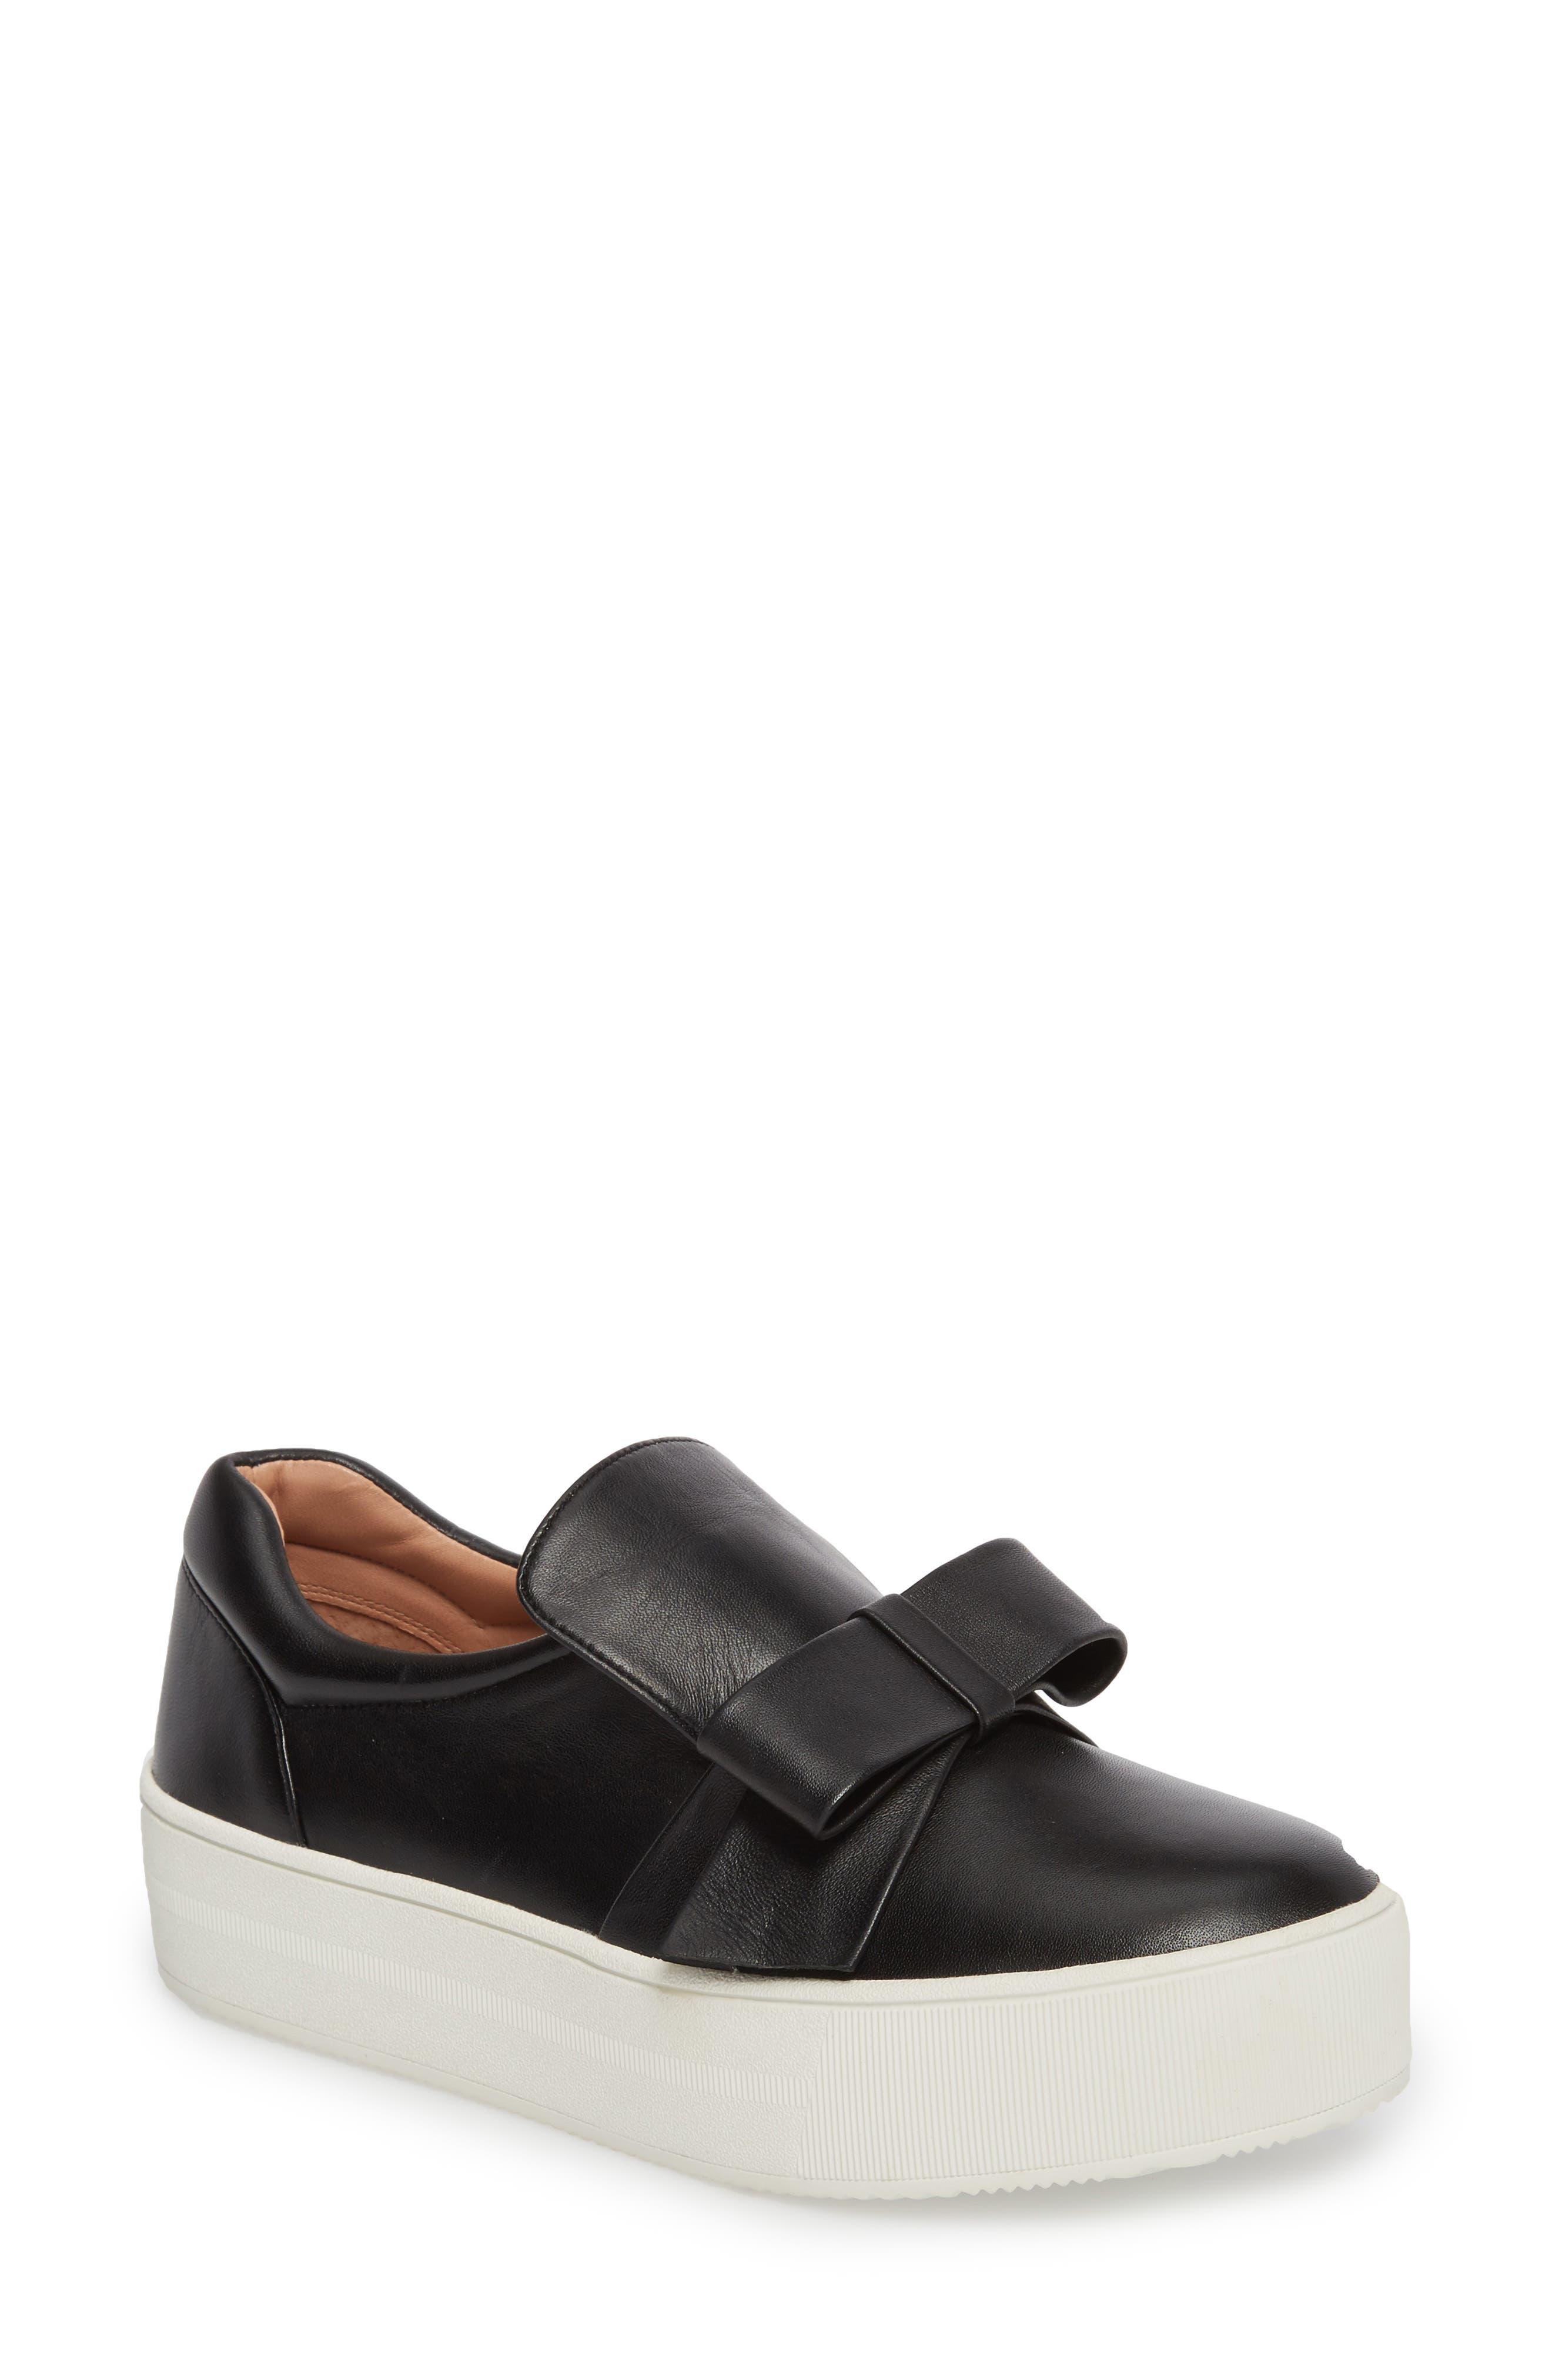 Vania Bow Platform Sneaker,                         Main,                         color, 001